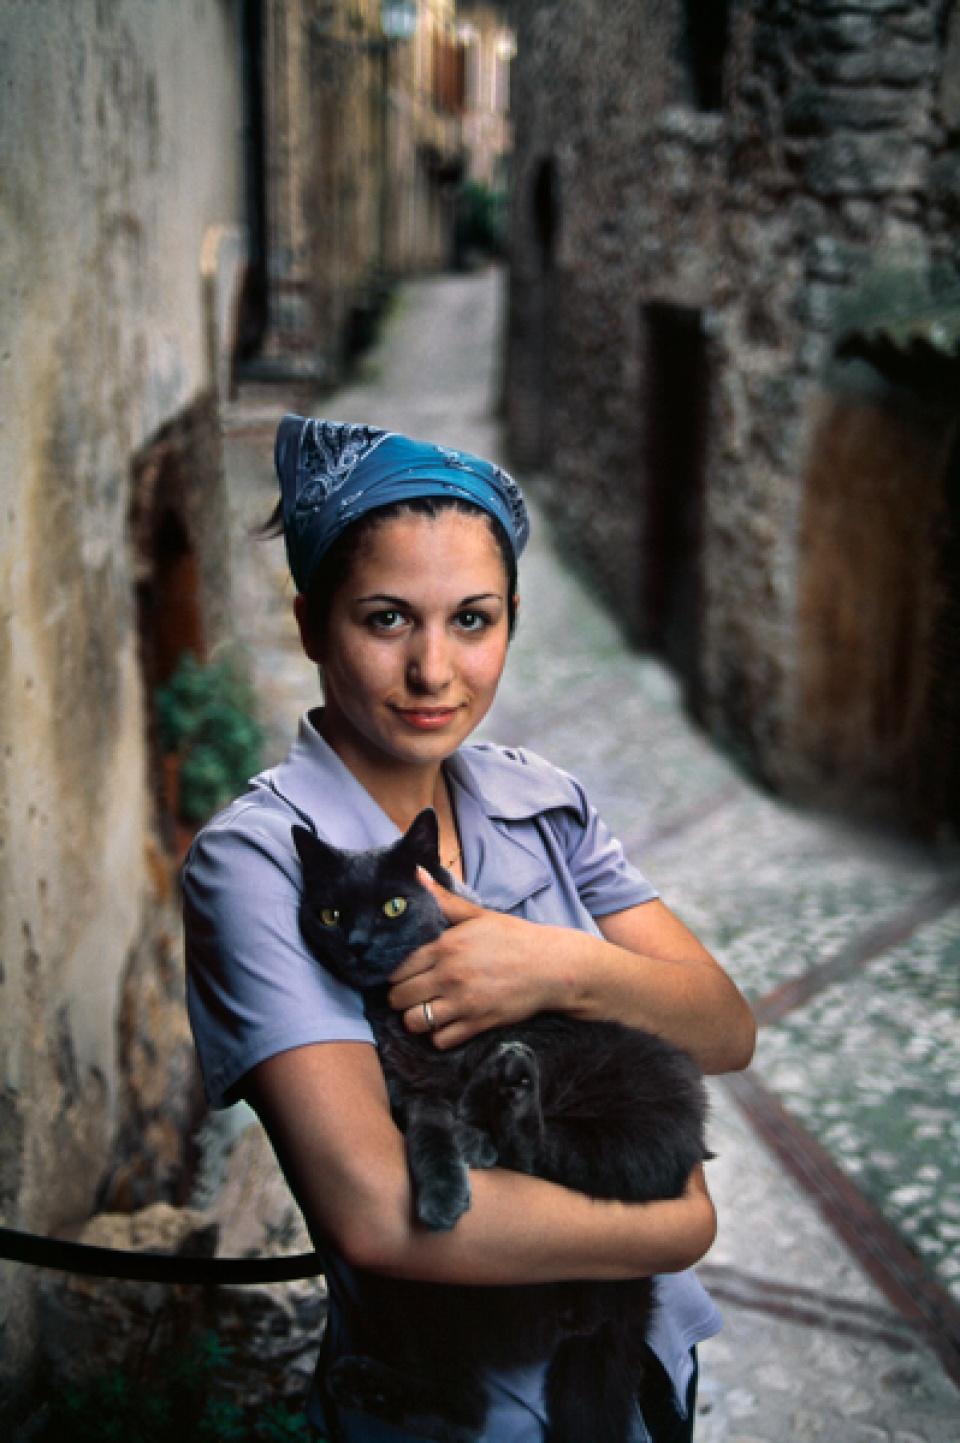 Steve McCurry. Camino, Italy